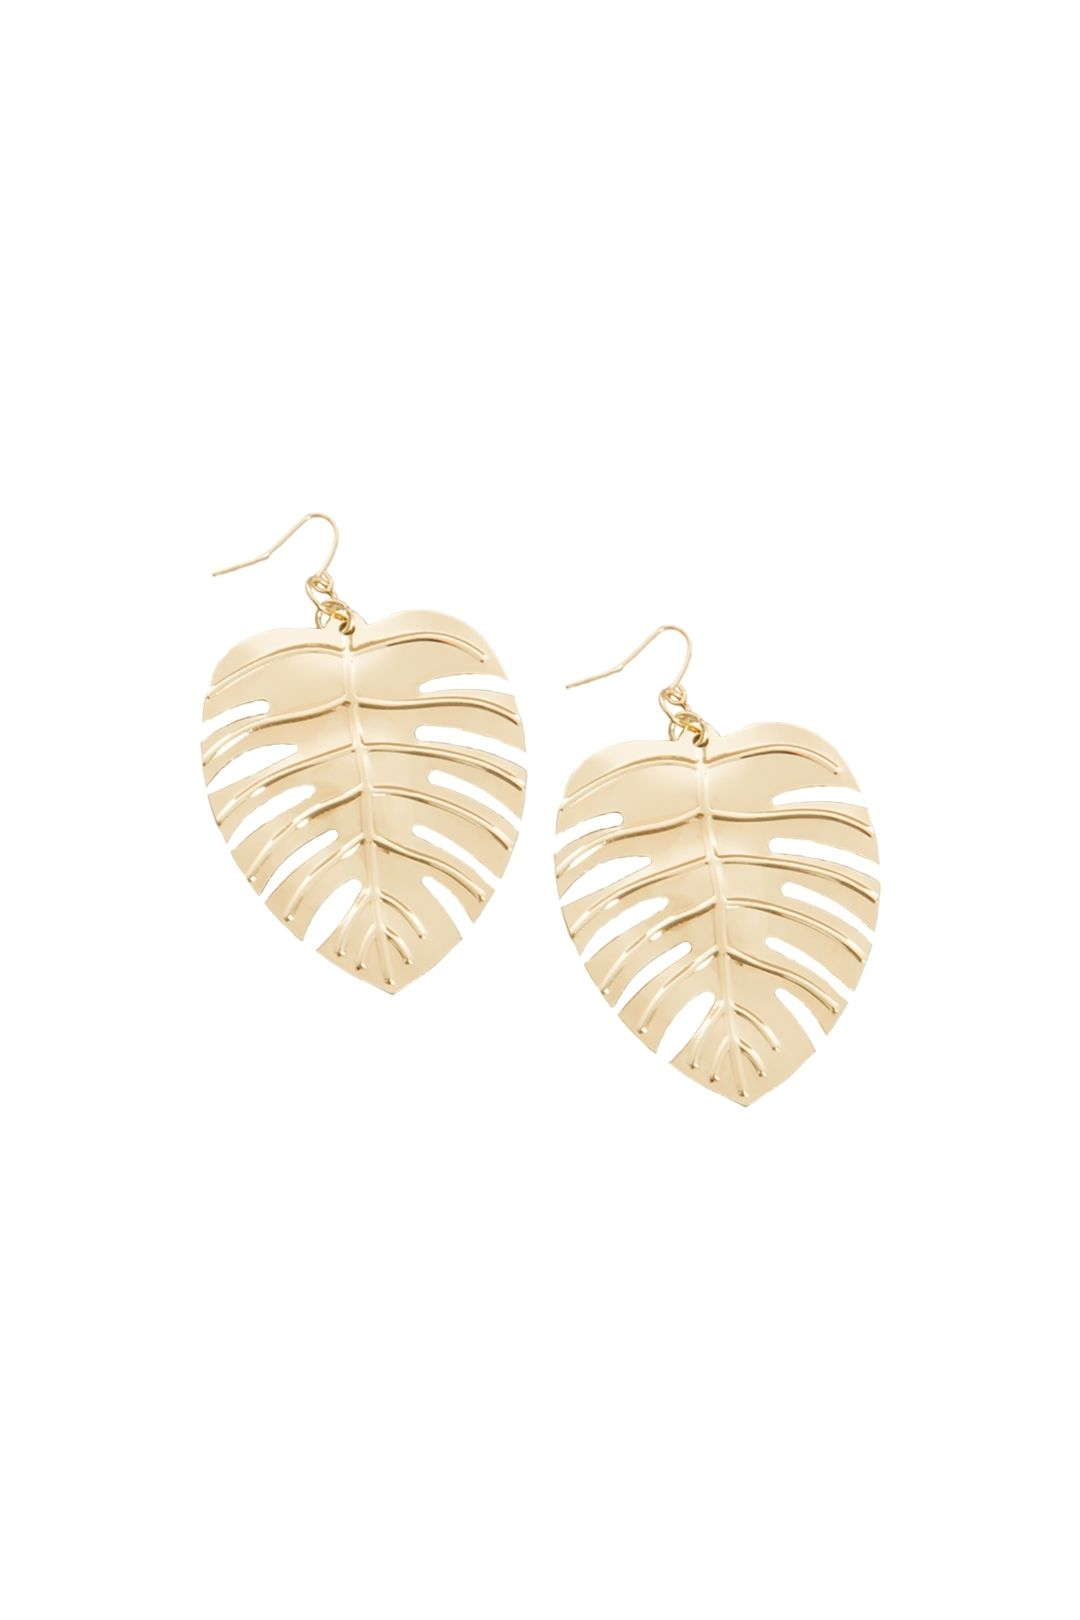 Adorne - Lightweight Monstera Earrings - Gold - Front